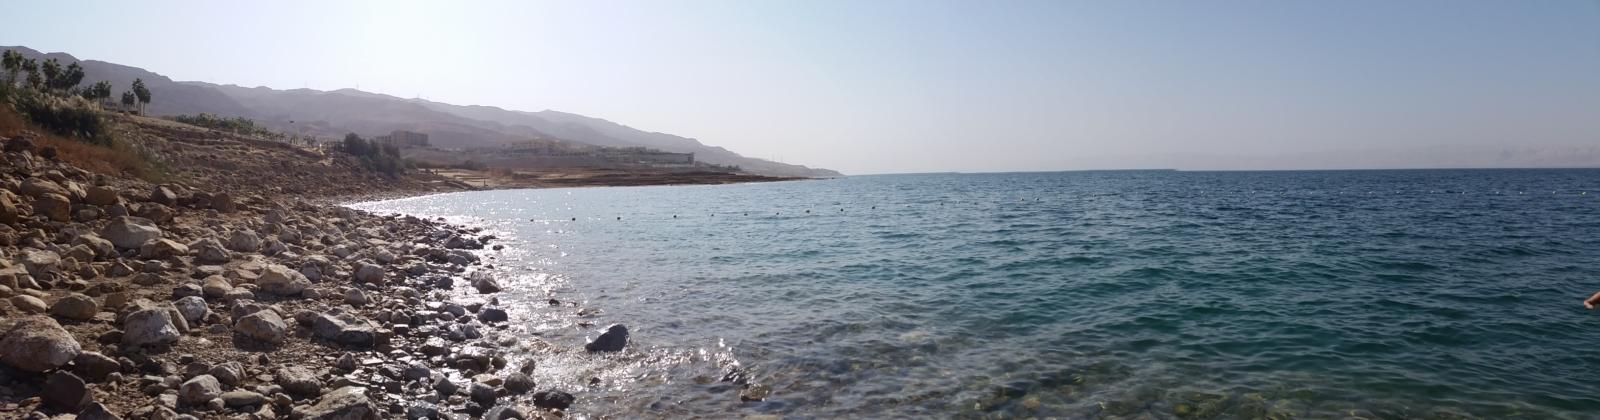 TUI_Jordanien_Totes Meer_Übersicht